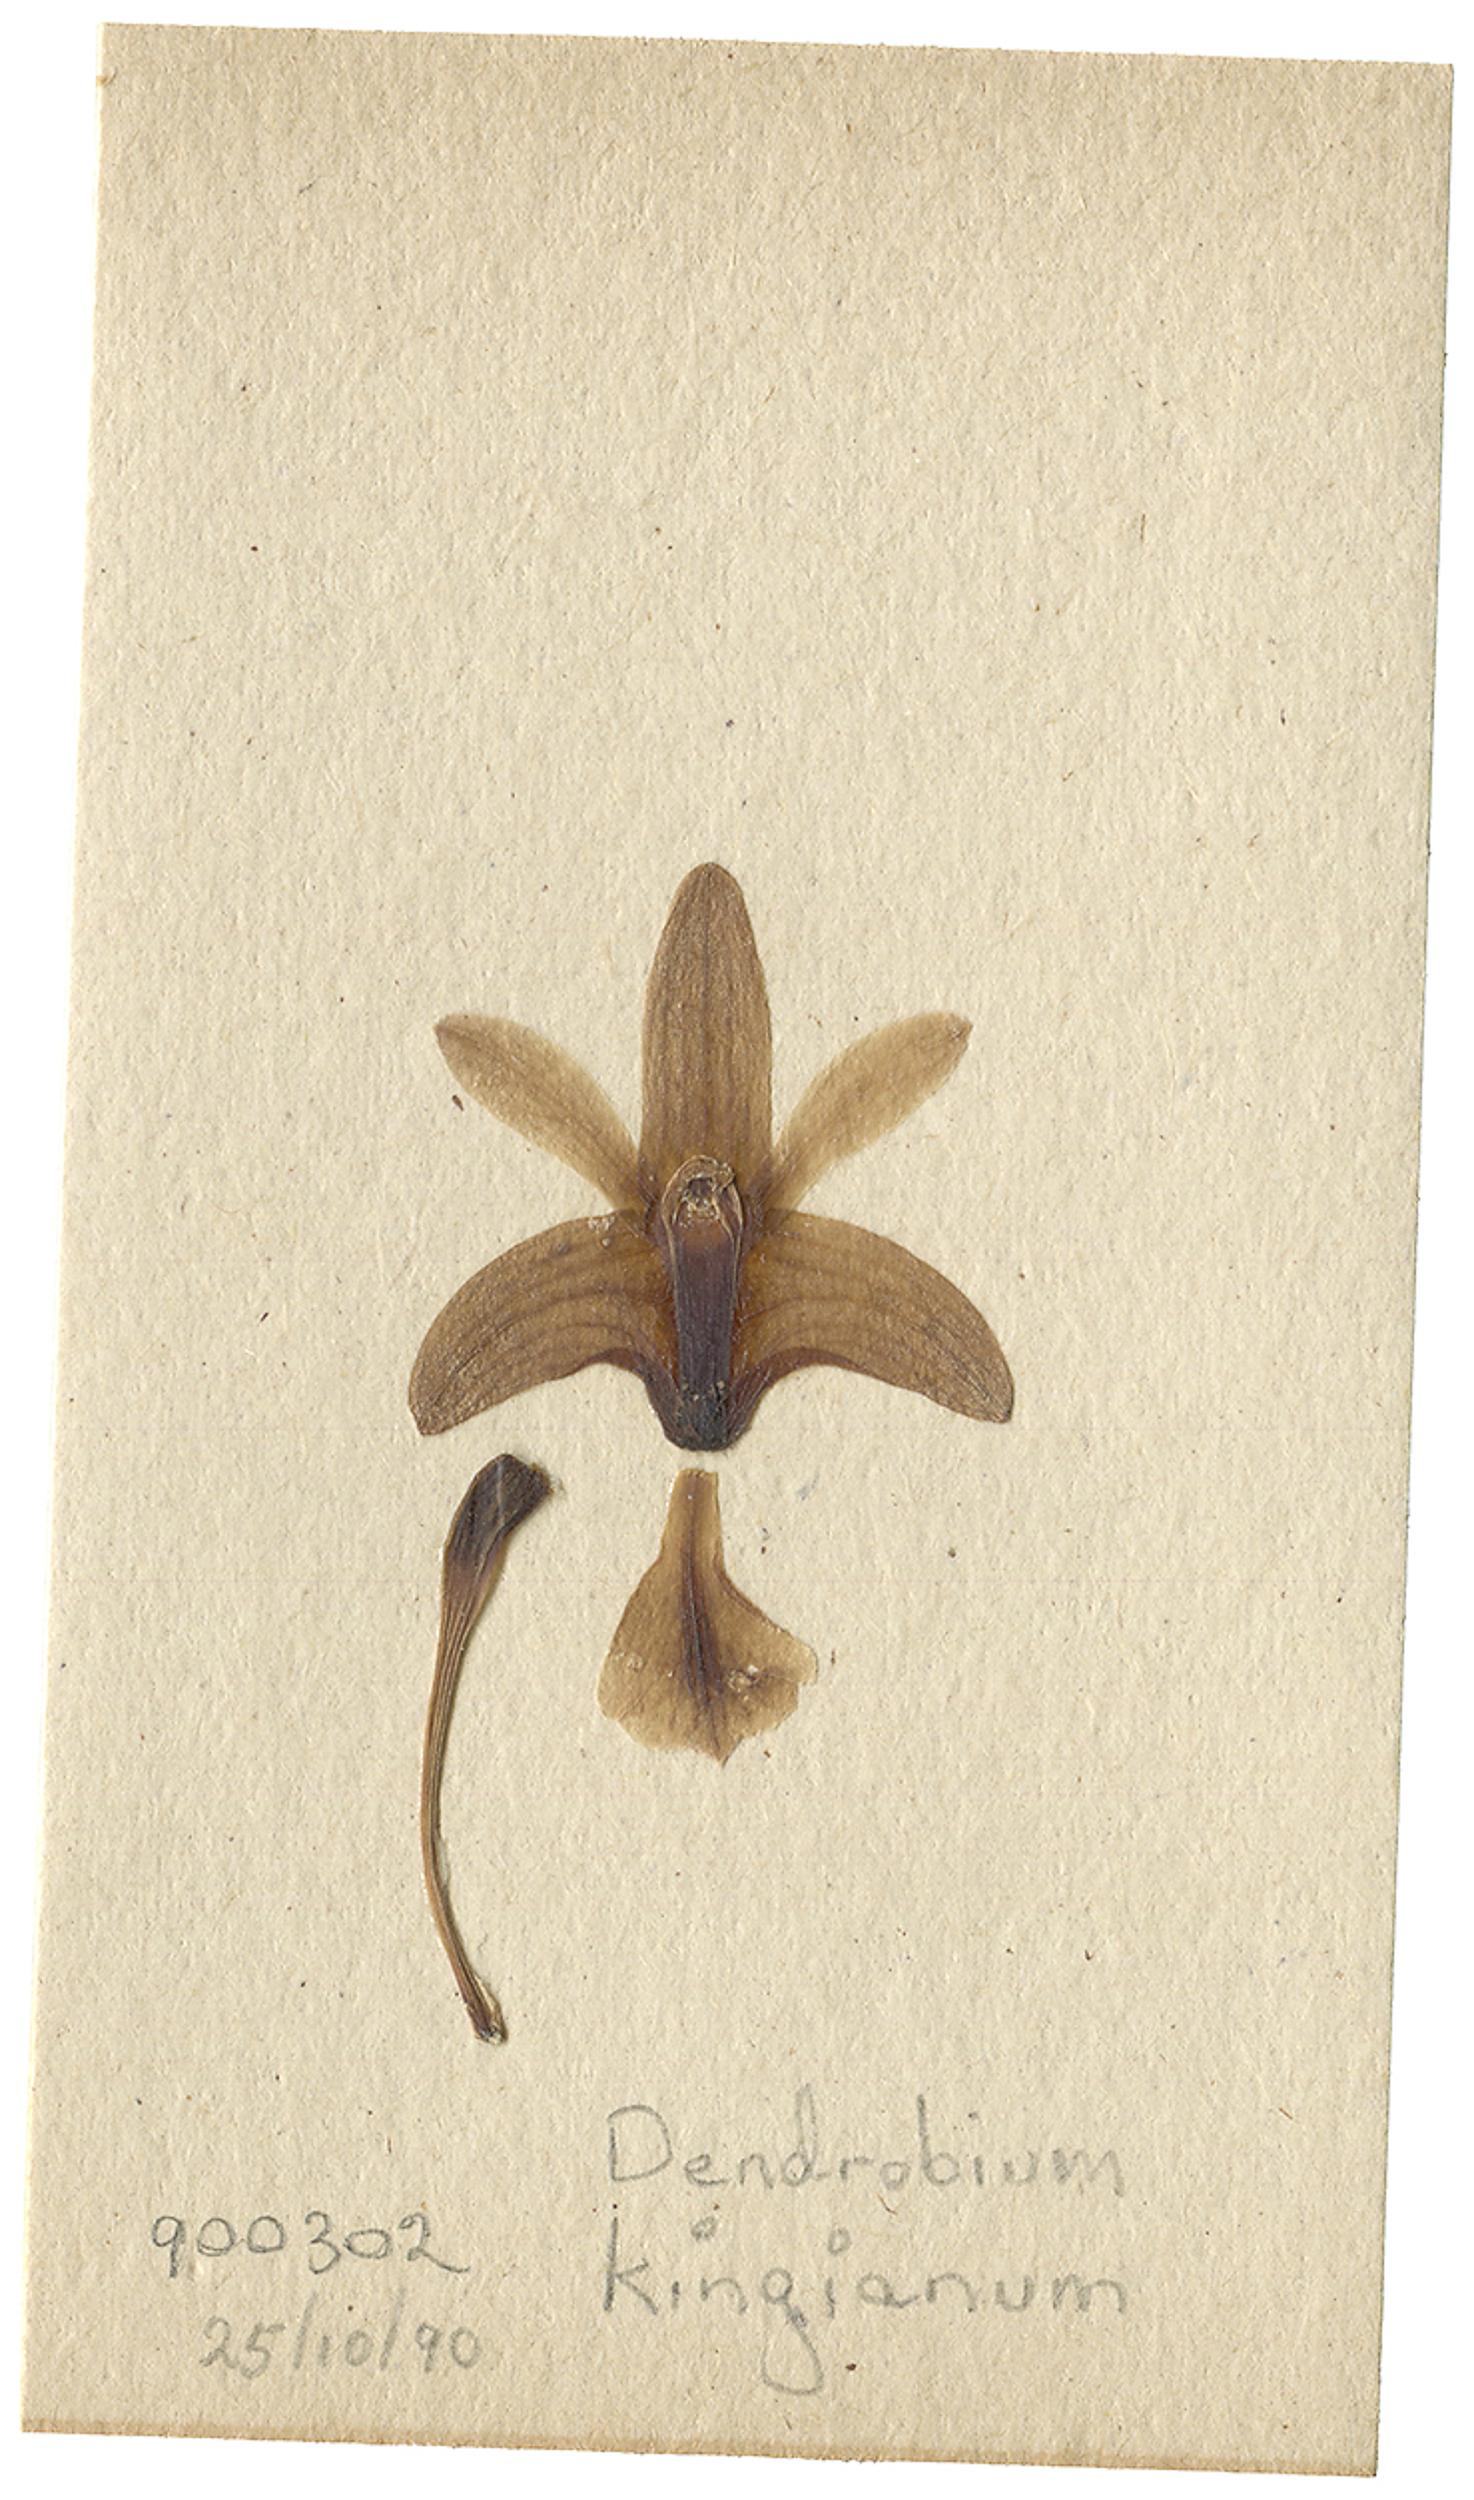 LYON 2017-06-24 Phils Orchid Specimens 287_D.jpg